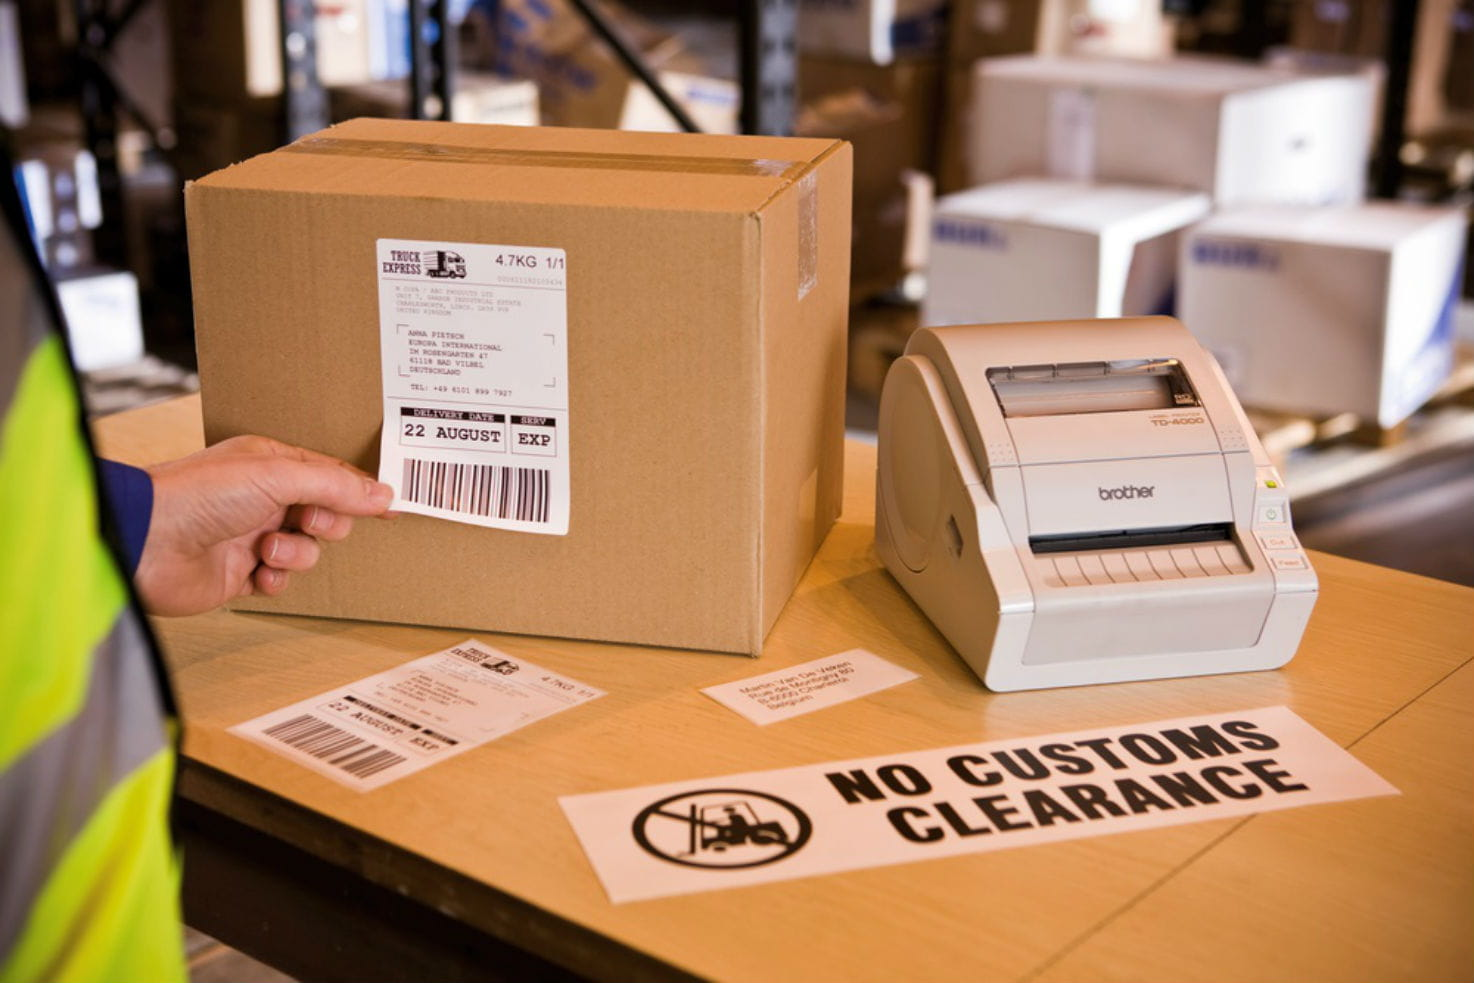 Impresora de etiquetas sobre caja con etiqueta No customs Clearance